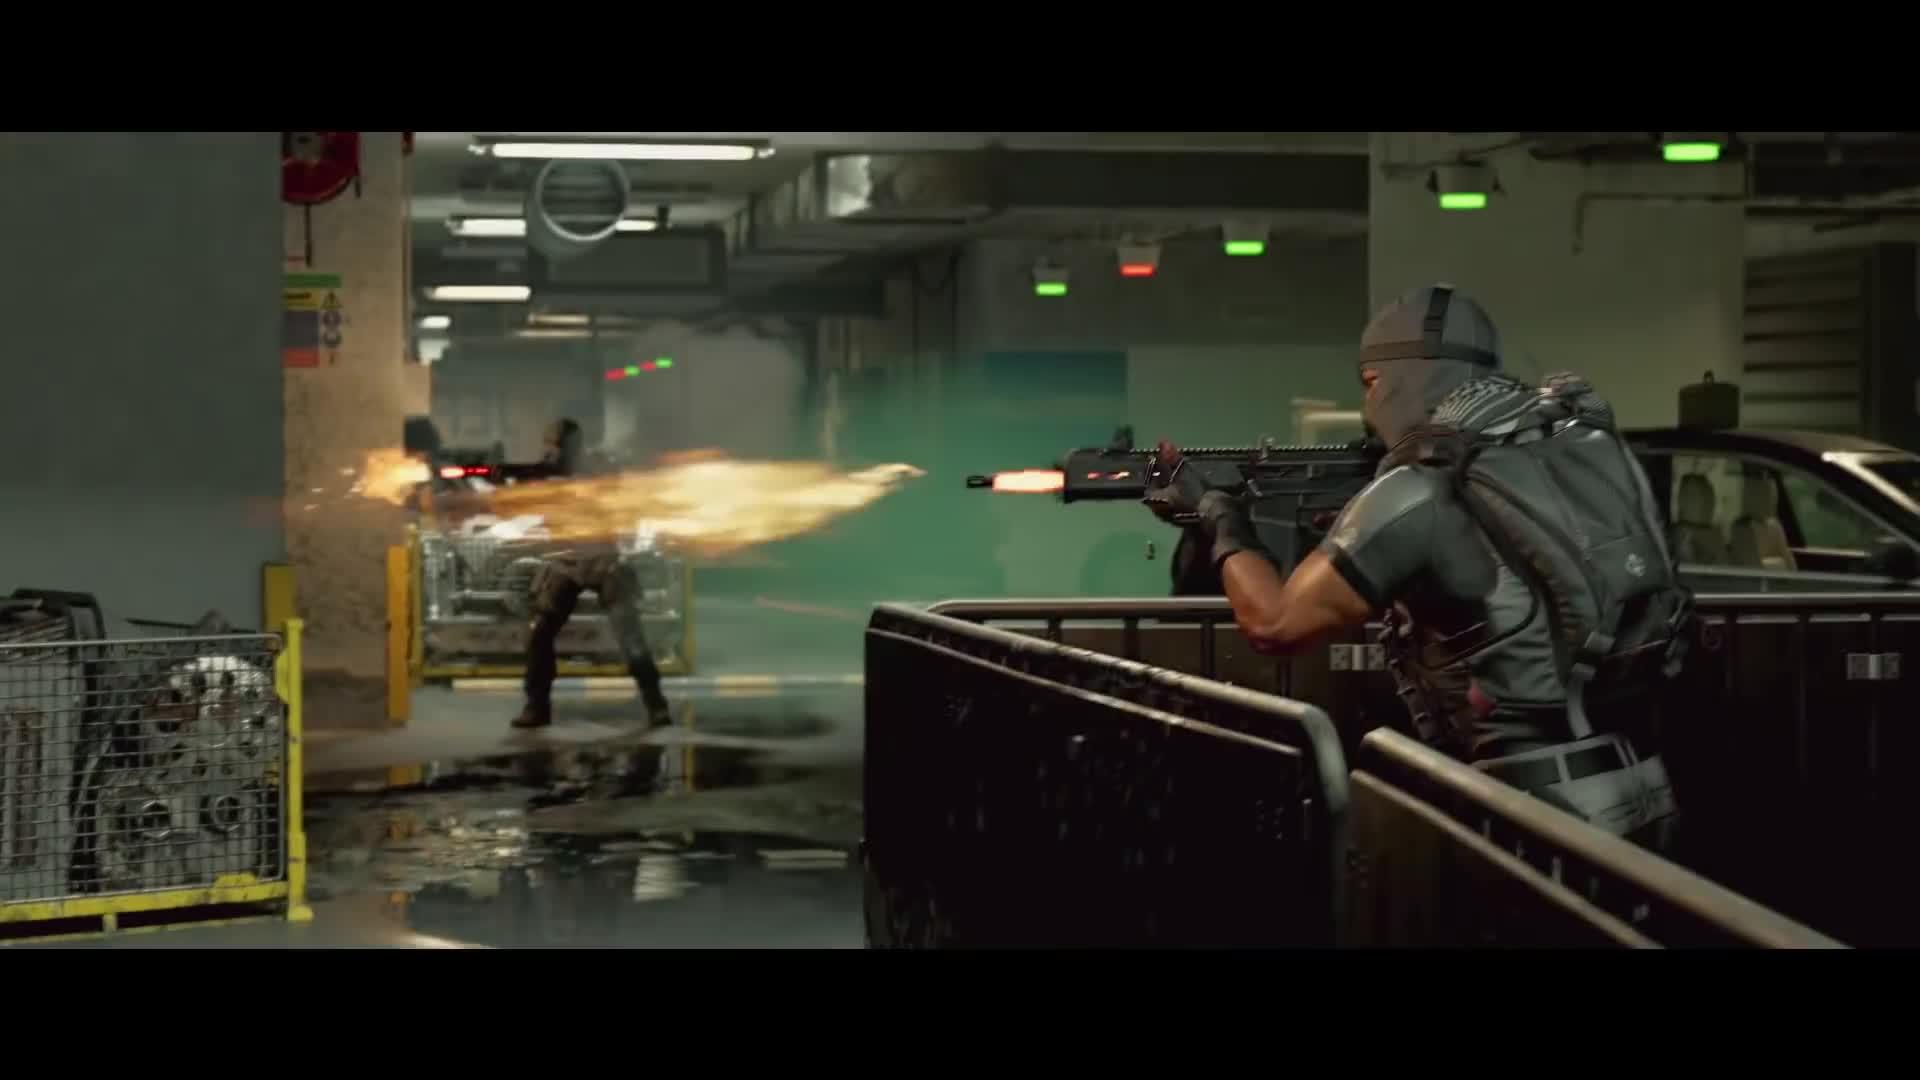 Trailer, Ubisoft, actionspiel, Tom Clancy, Tom Clancy's The Division, The Division, The Division 2, Tom Clancy's The Division 2